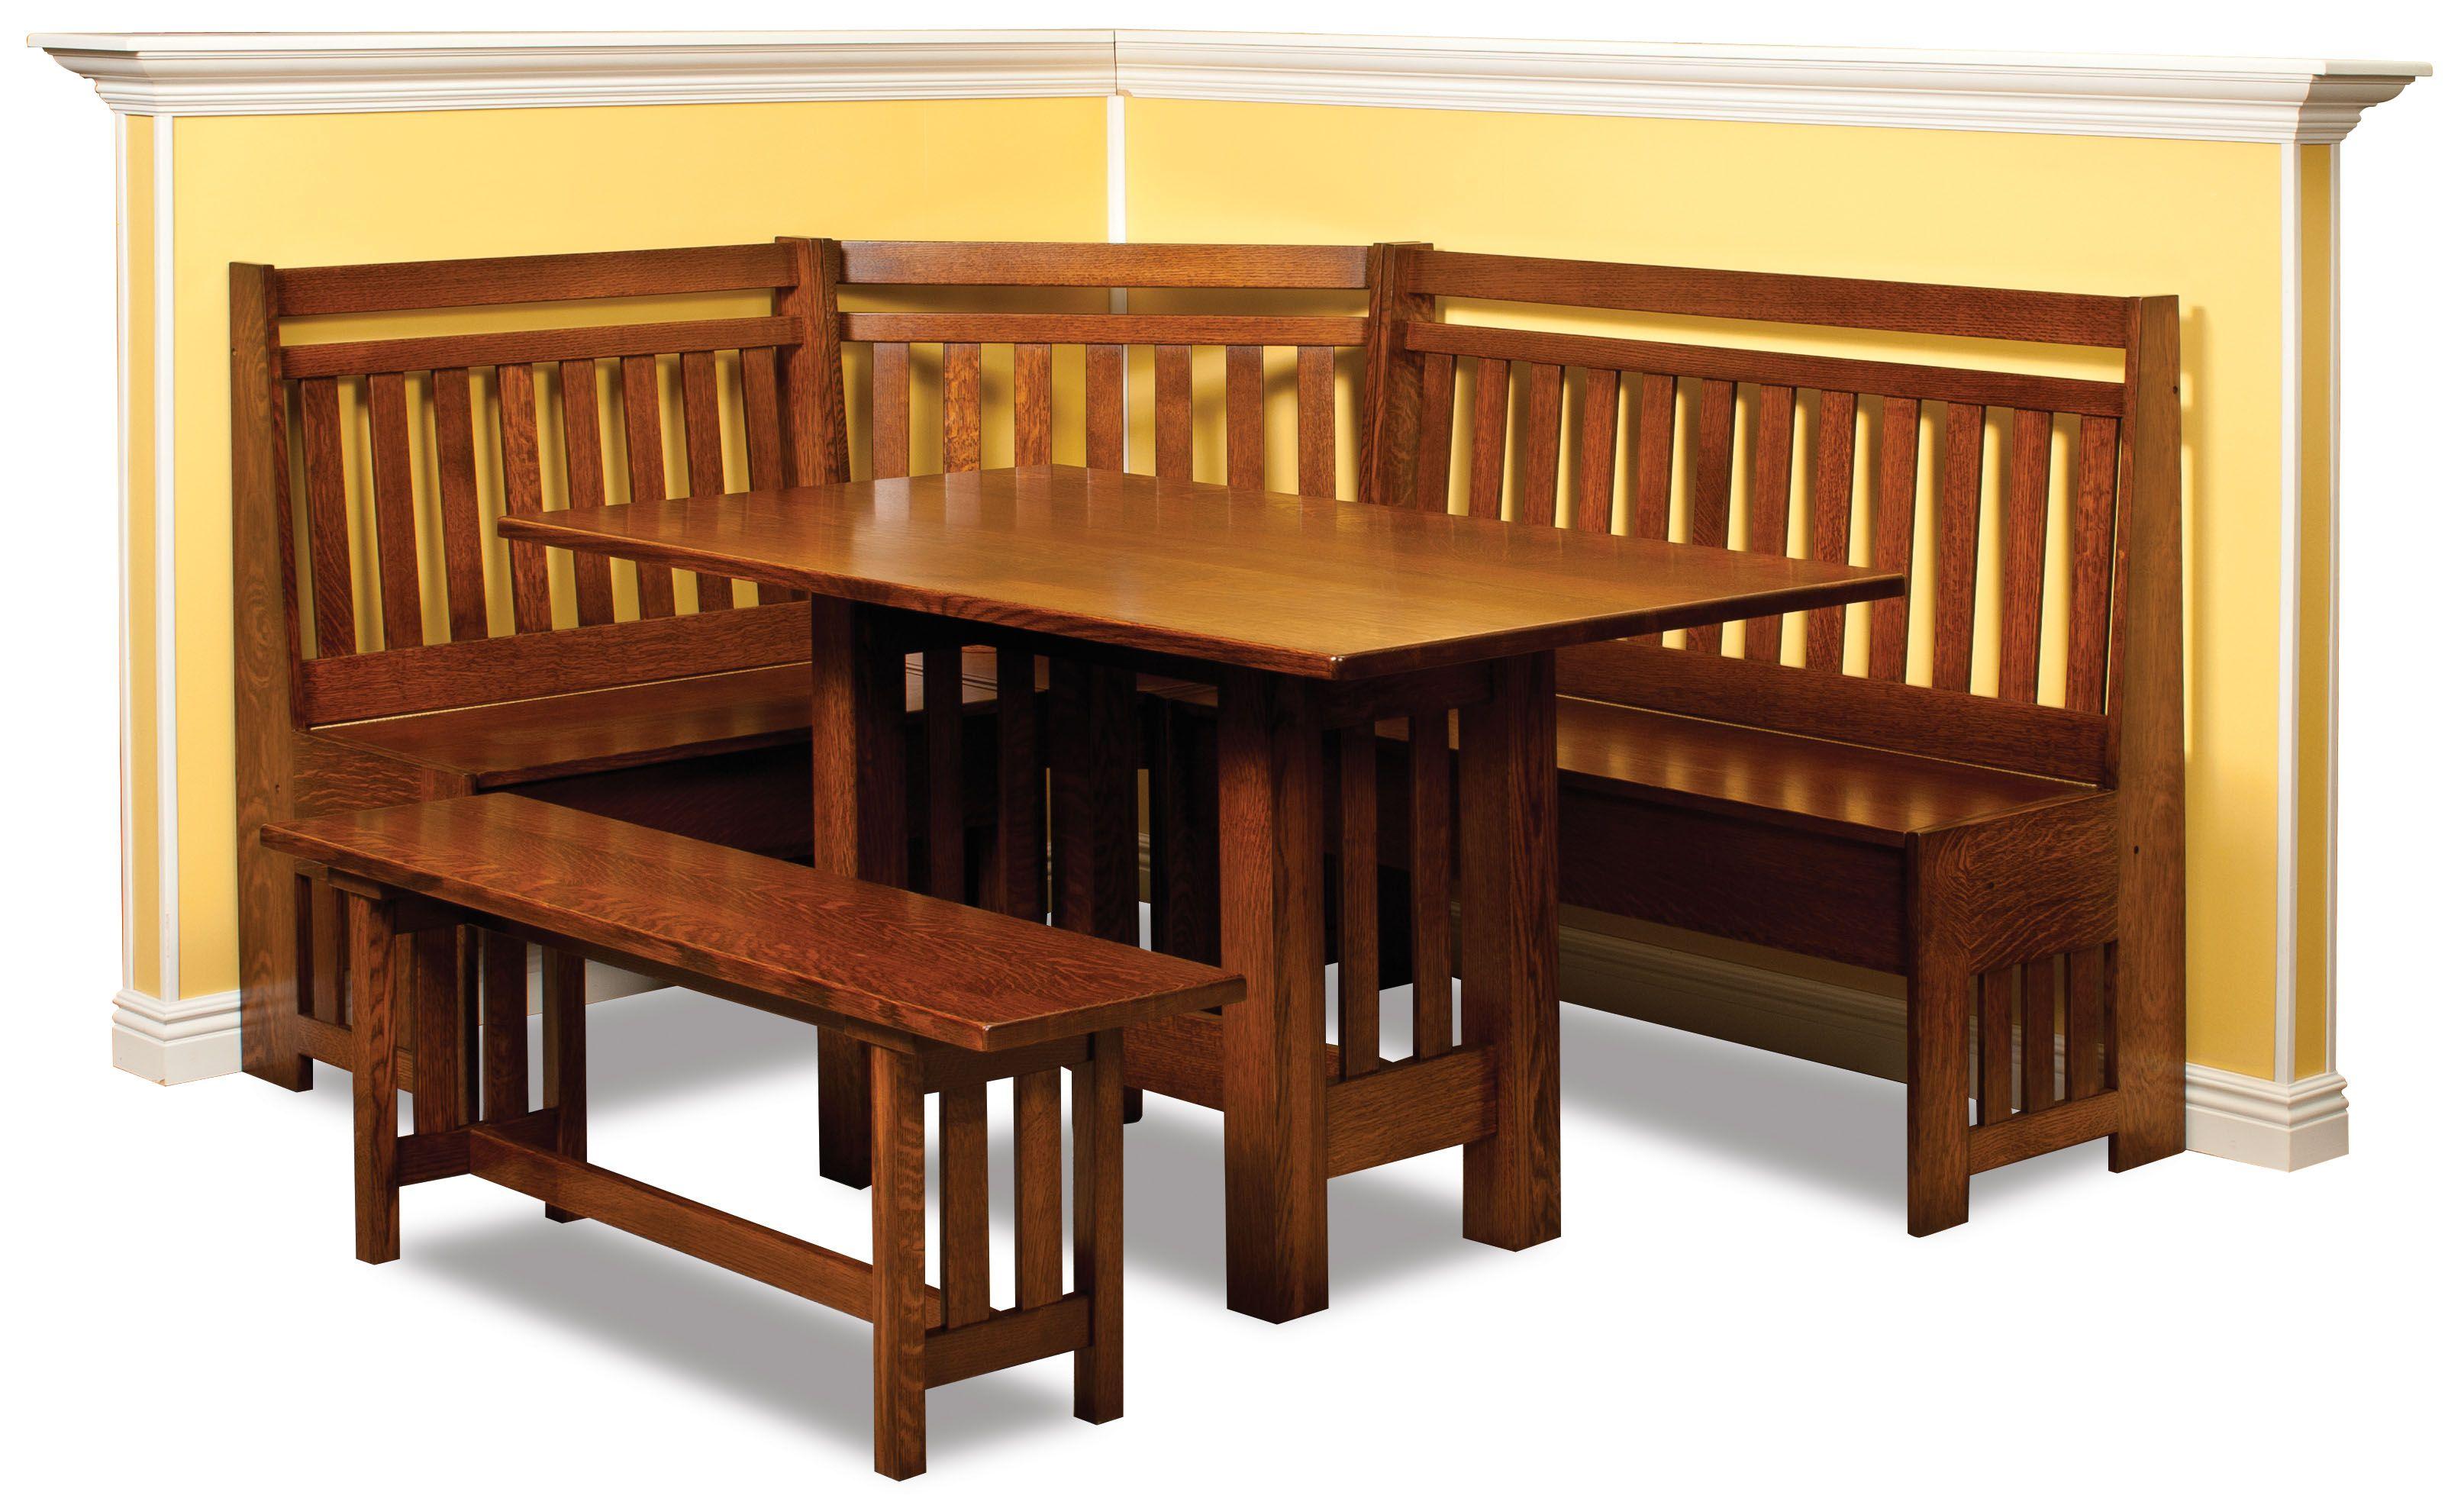 Wana Furniture Amish Furniture Shipshewana In Breakfast Nook Set Nook Dining Set Corner Dining Nook